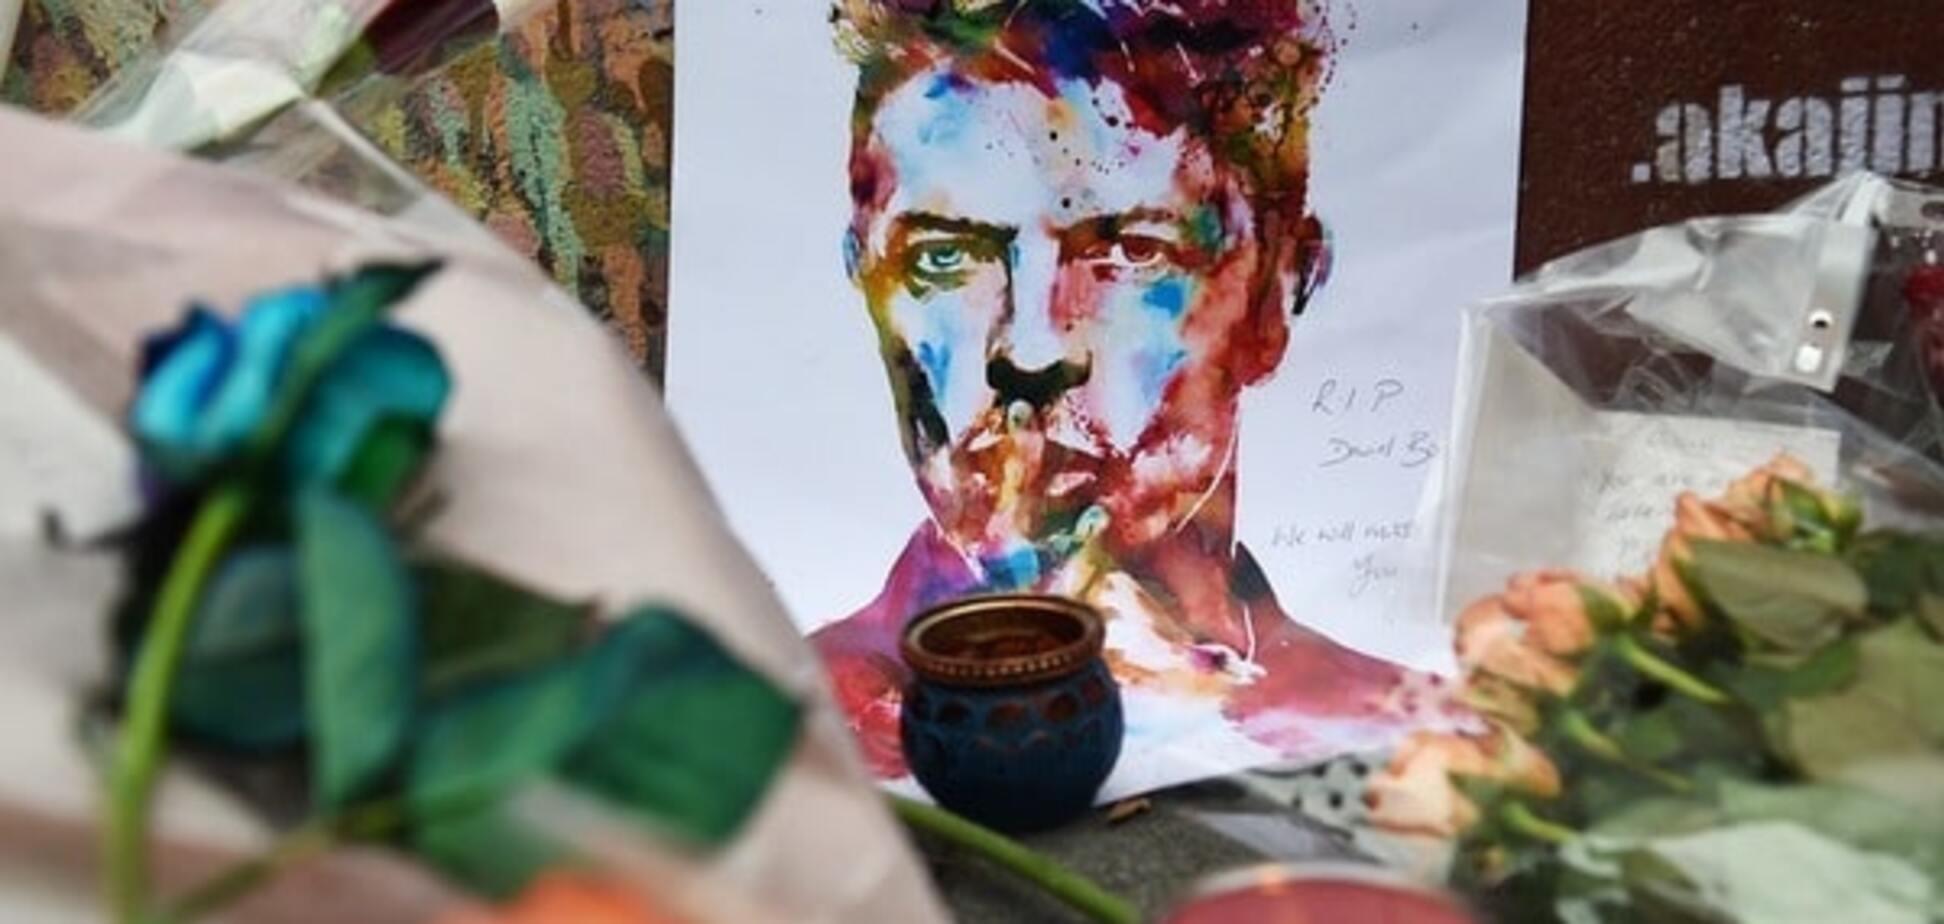 'Титан пал': музыканты скорбят о смерти Дэвида Боуи